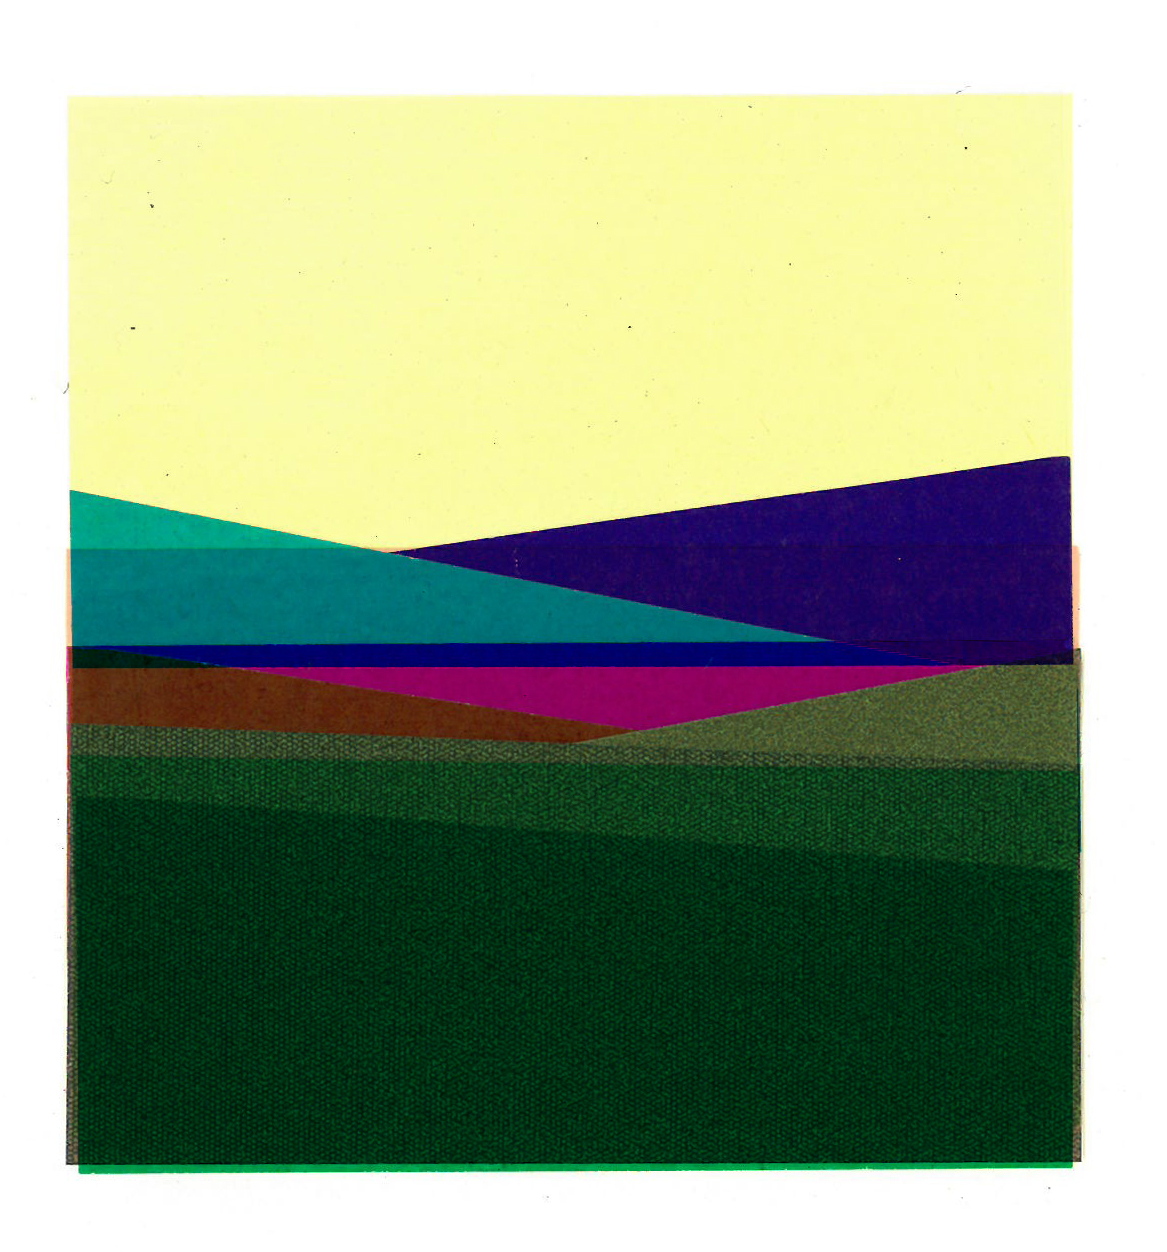 Layered Landscape7 copy.jpg